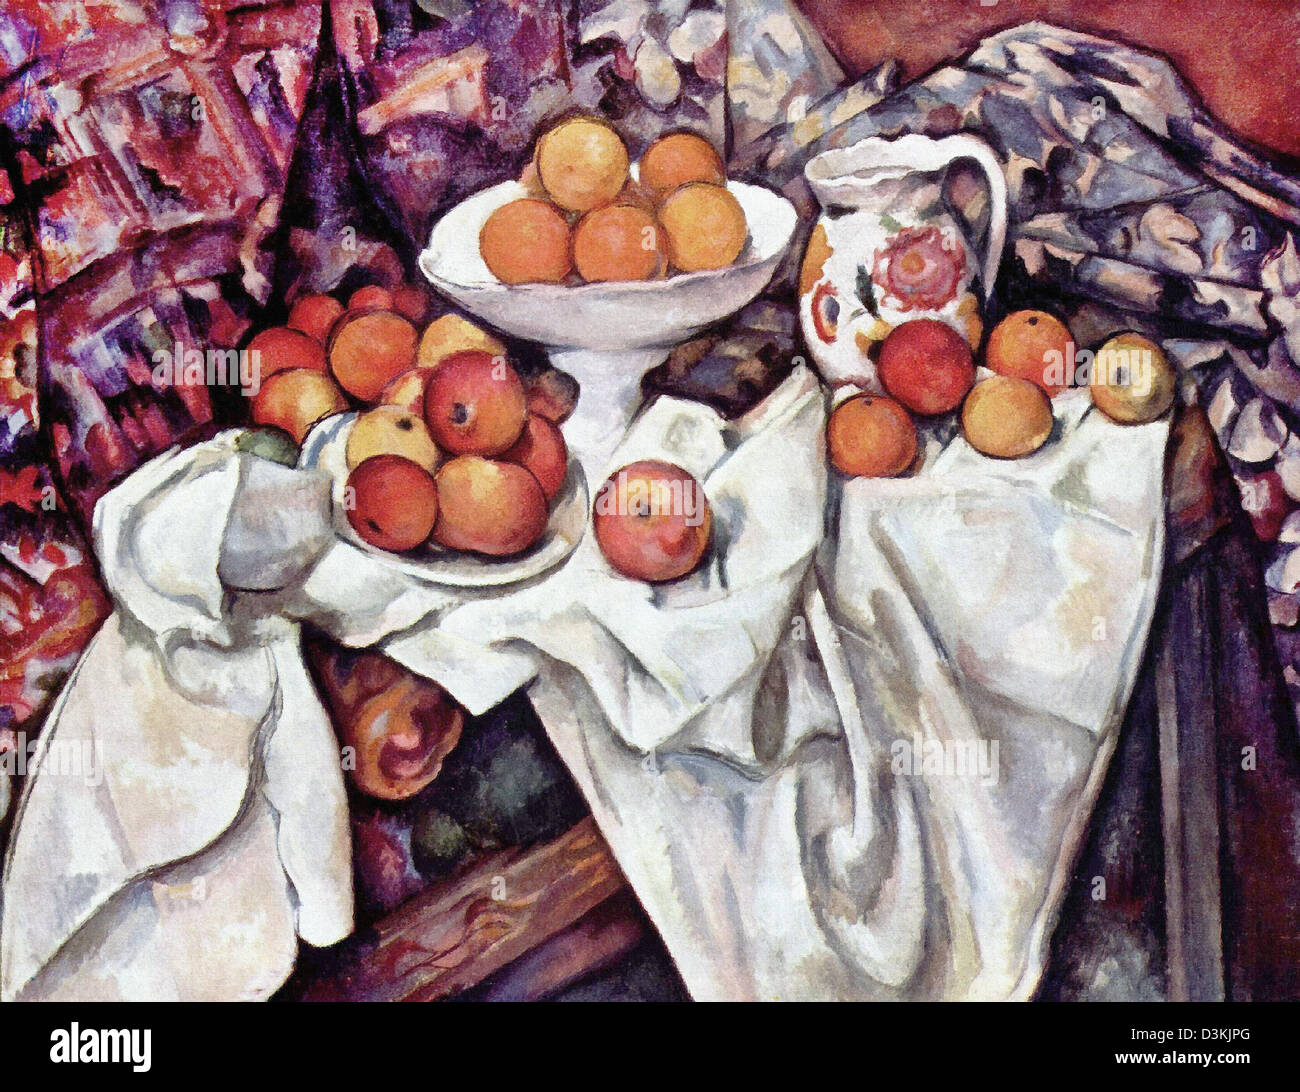 Paul Cezanne, Apples and Oranges 1899 Oil on canvas. Musée d'Orsay, Paris - Stock Image